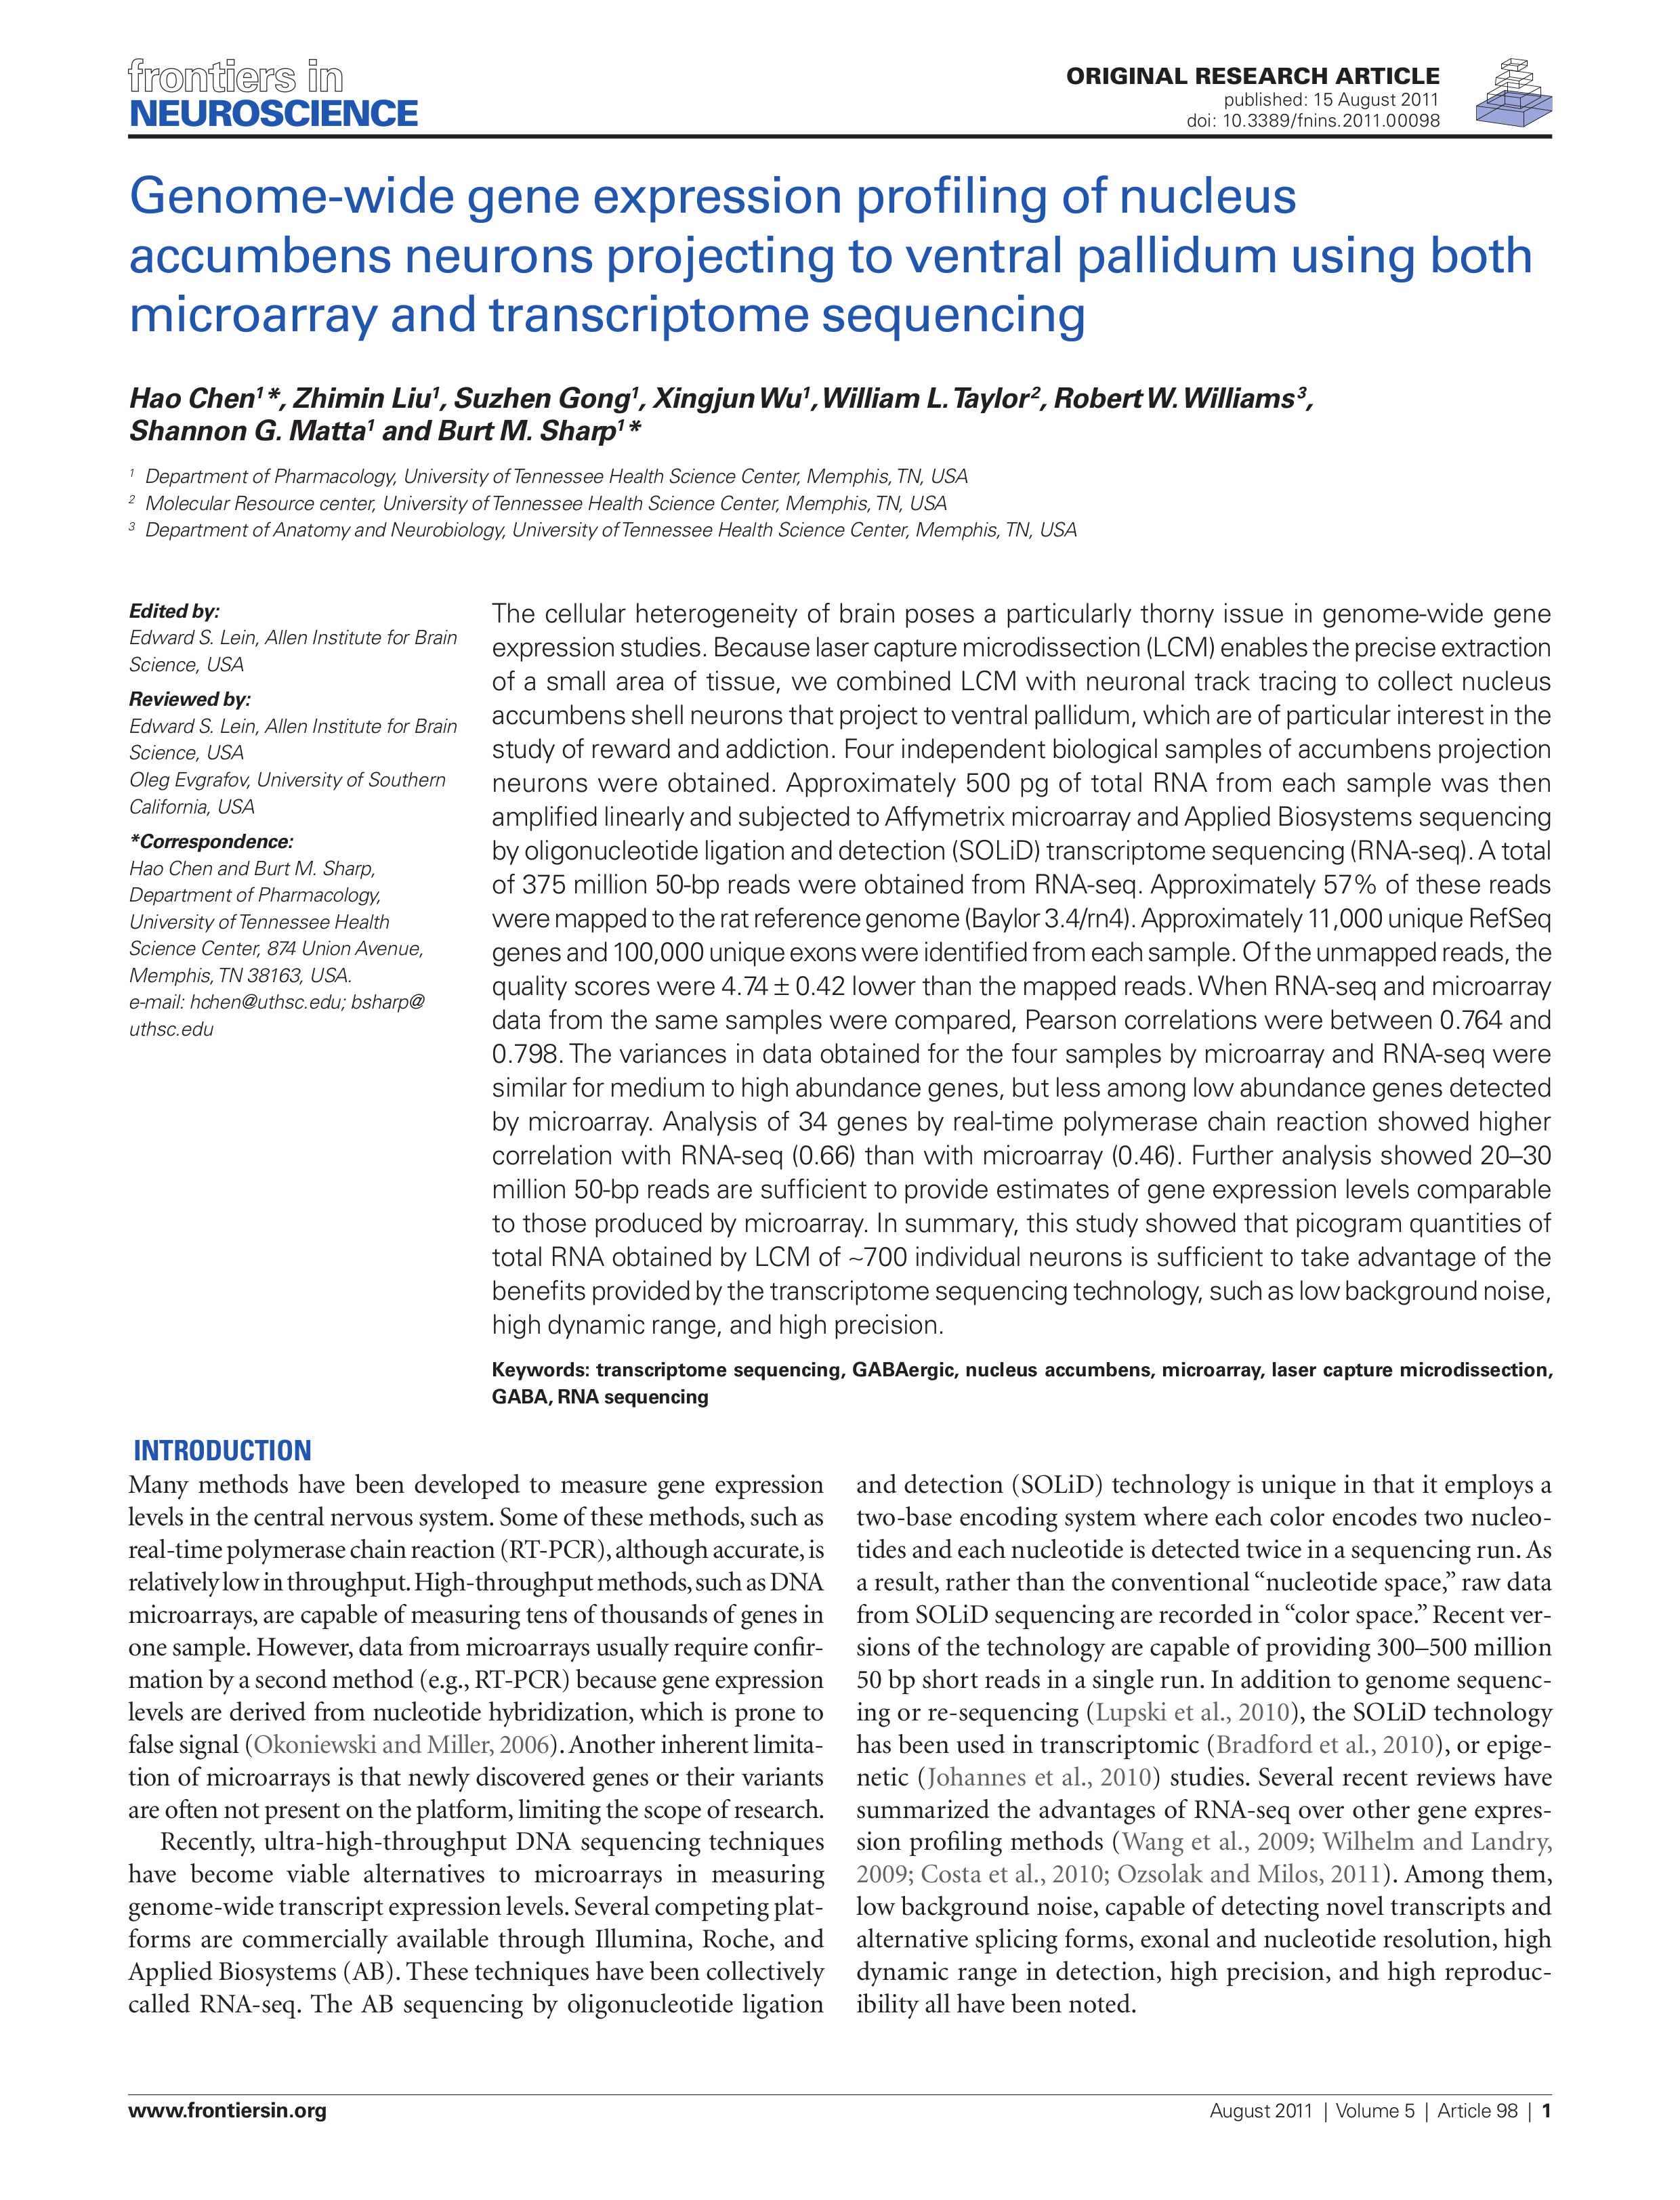 Chen et al. - 2011 - Frontiers in neuroscience.png